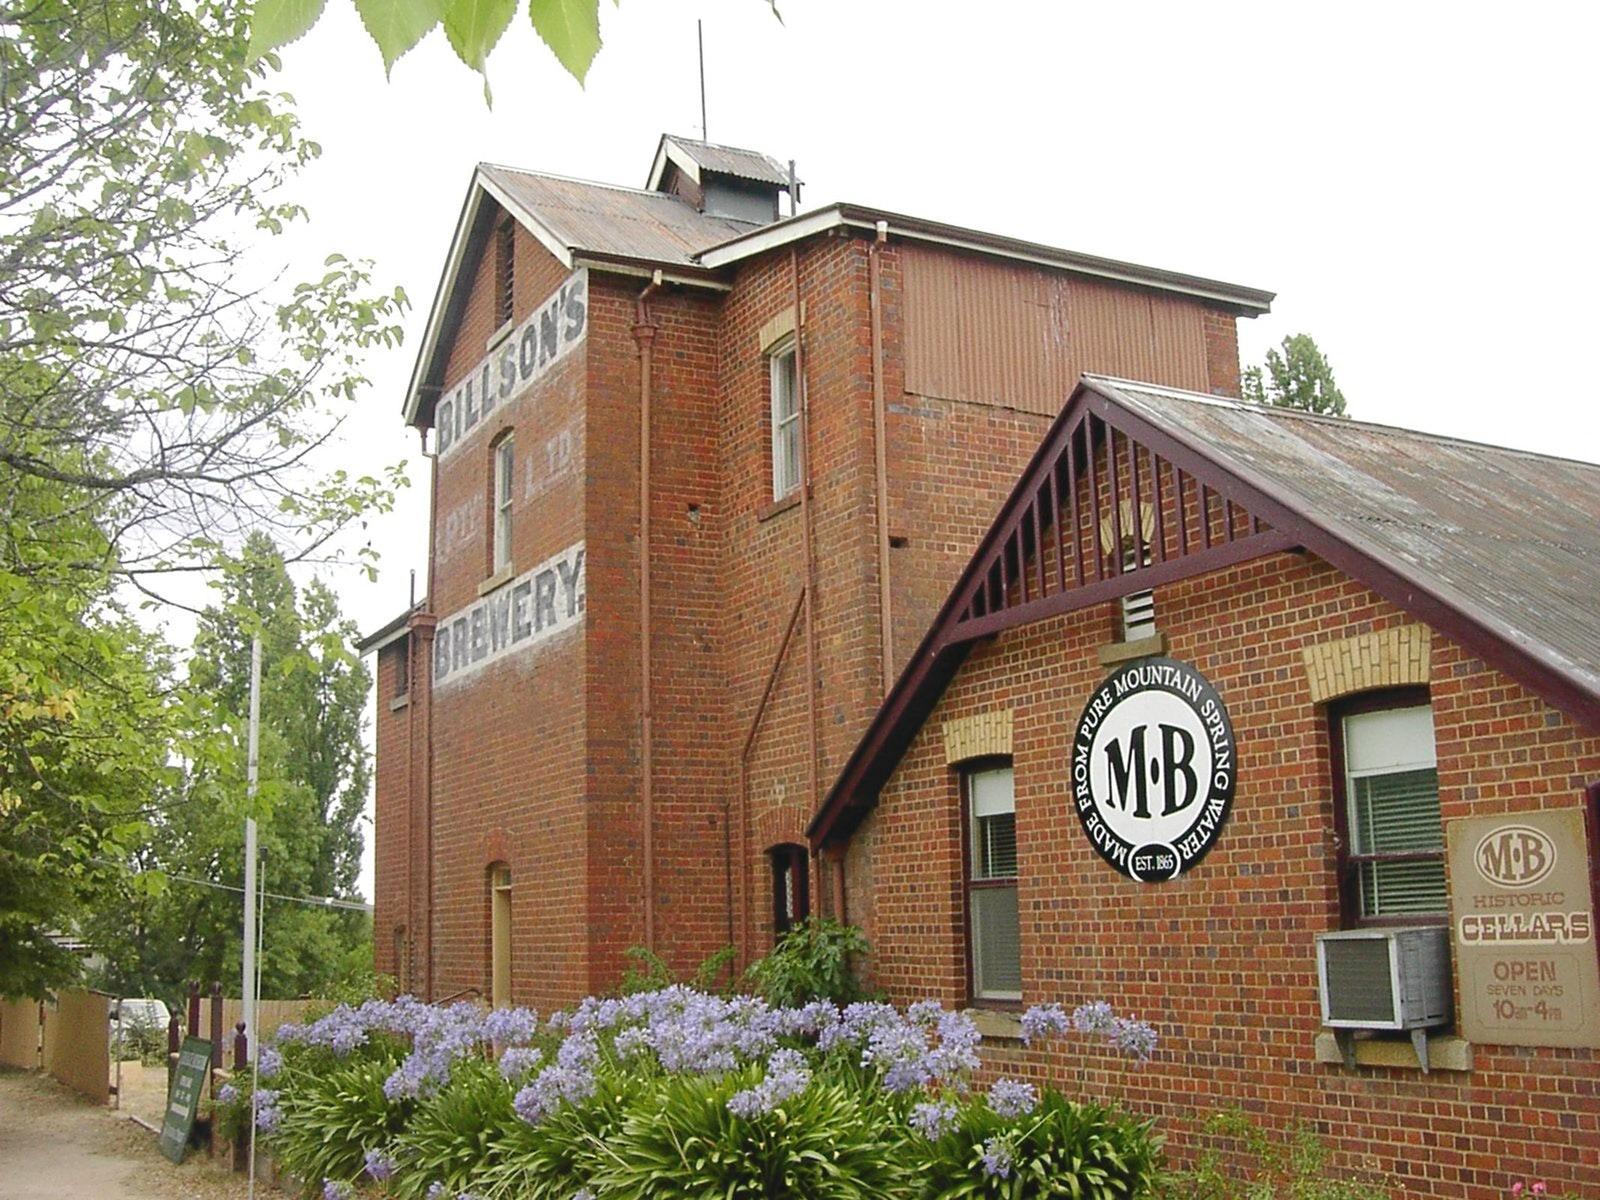 Murray Breweries